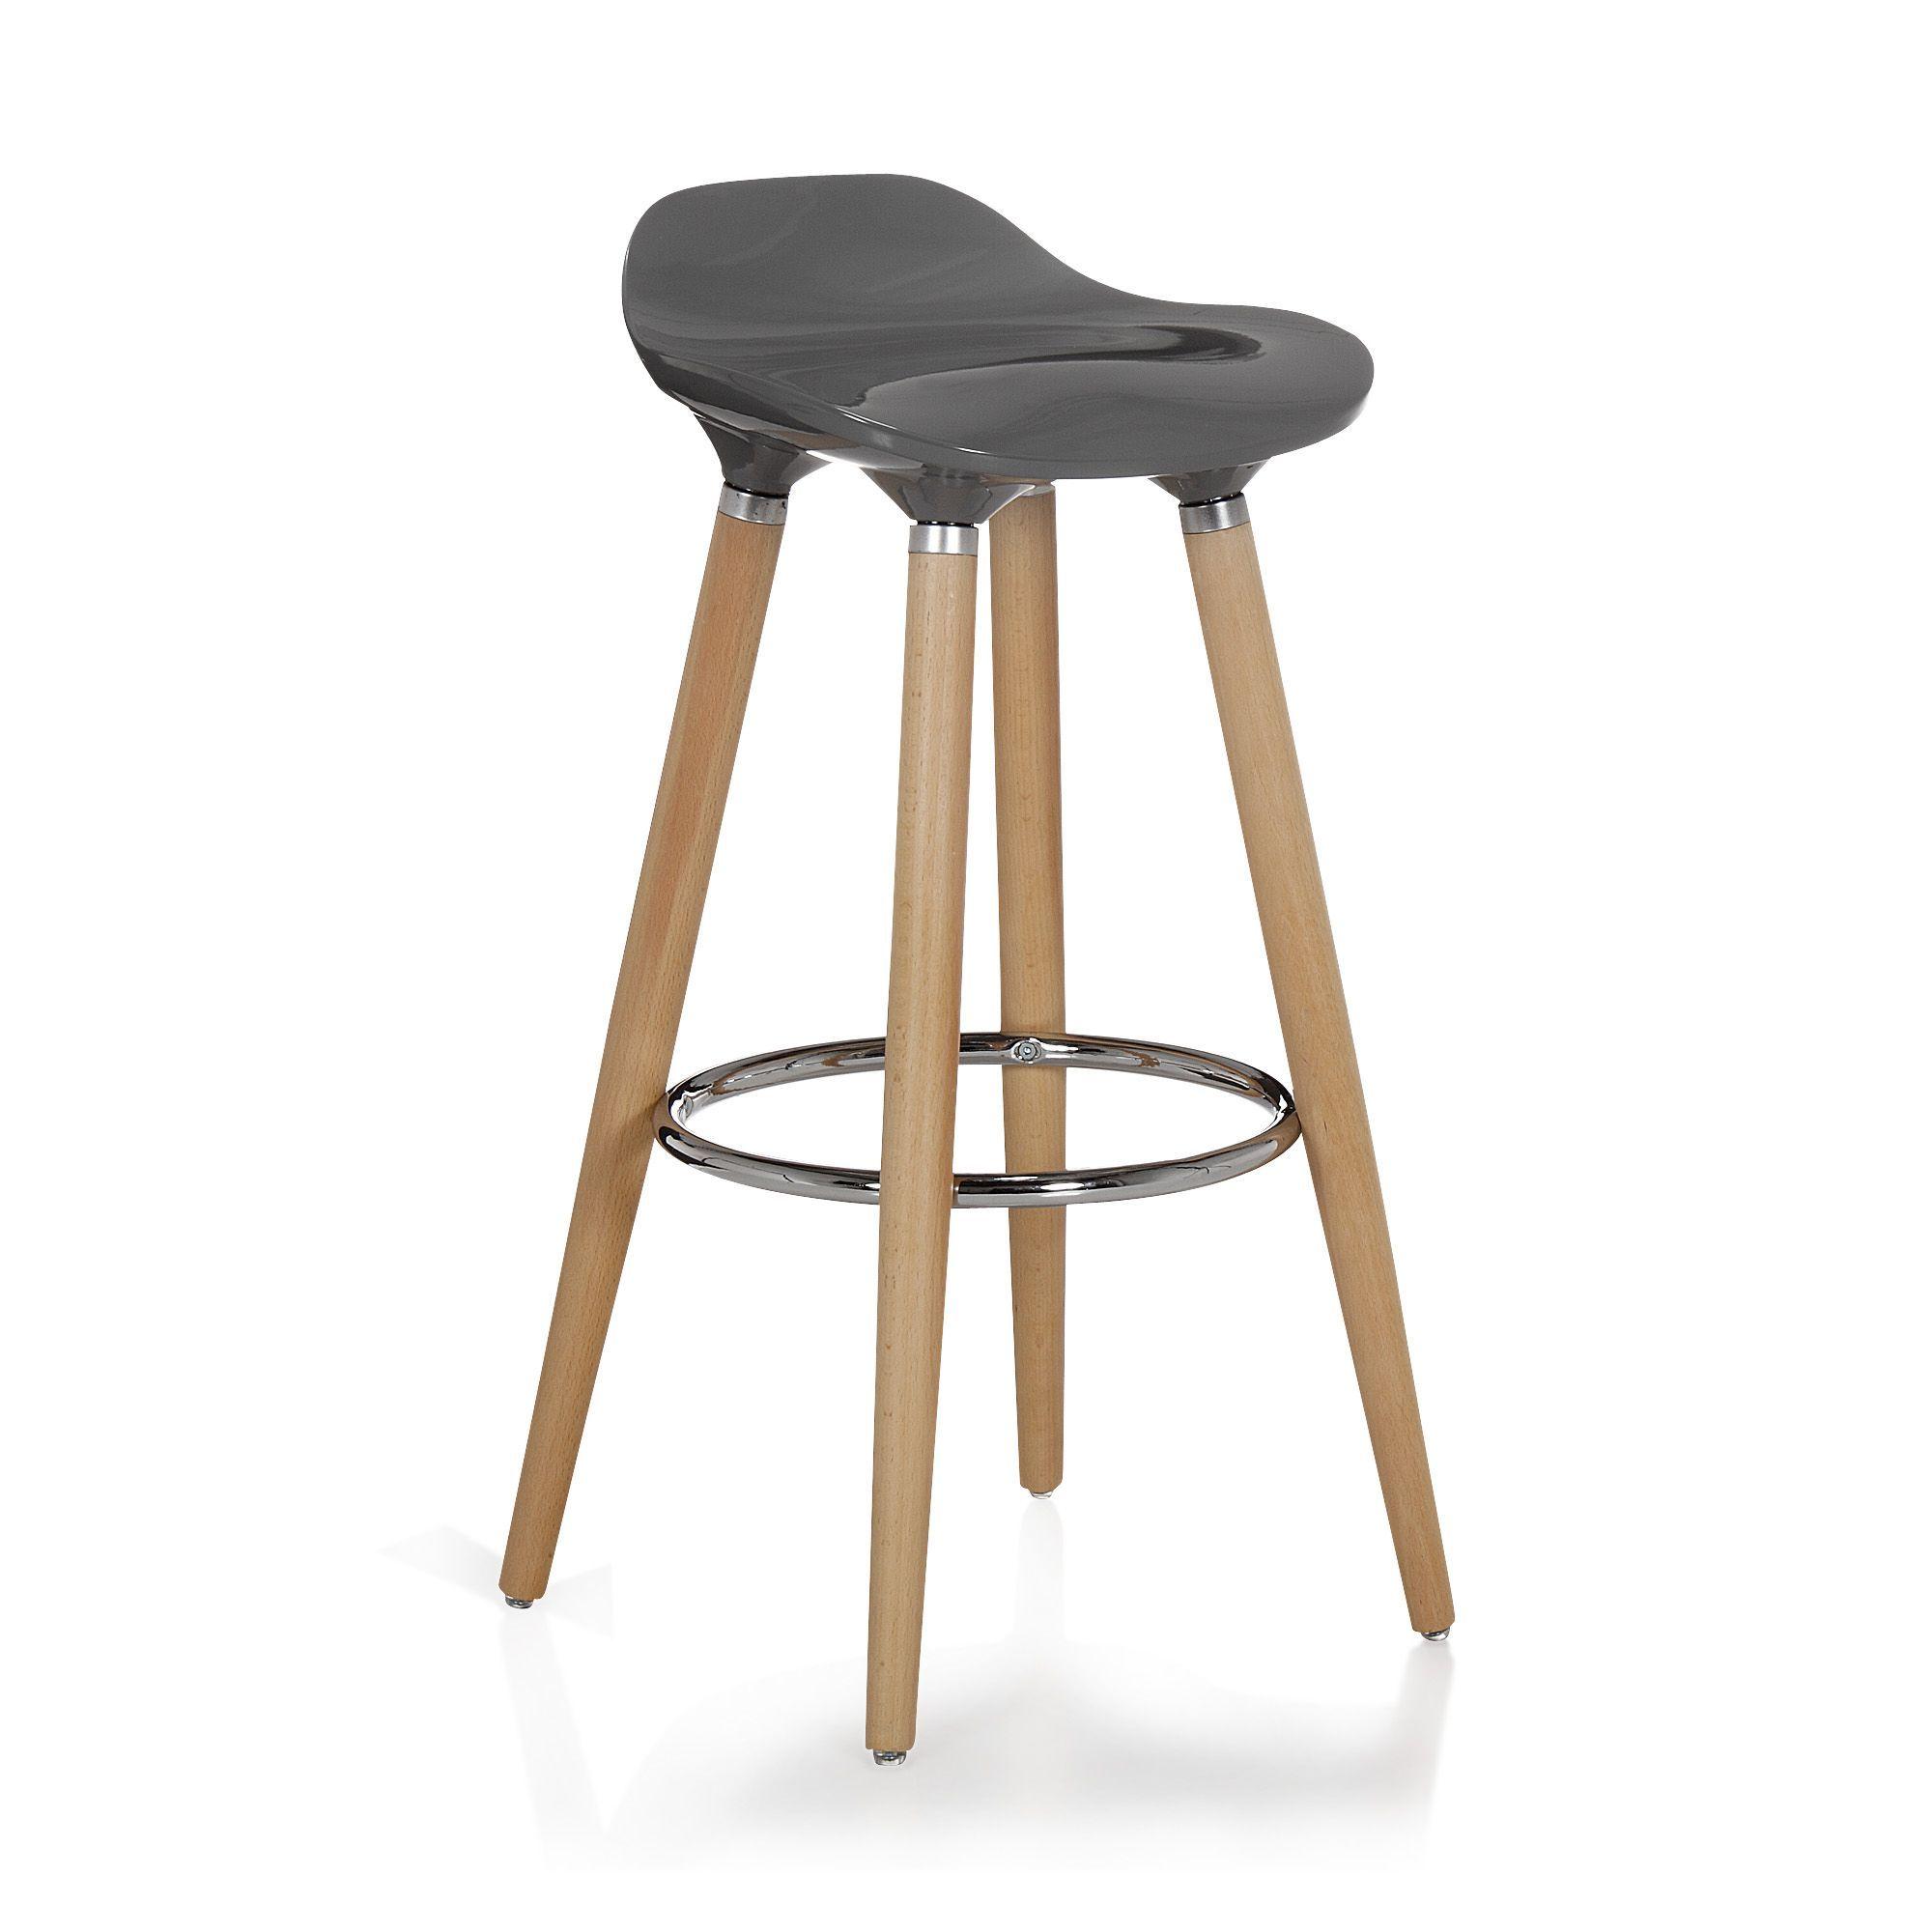 tabouret de bar gris avec pieds en h tre massif jade. Black Bedroom Furniture Sets. Home Design Ideas